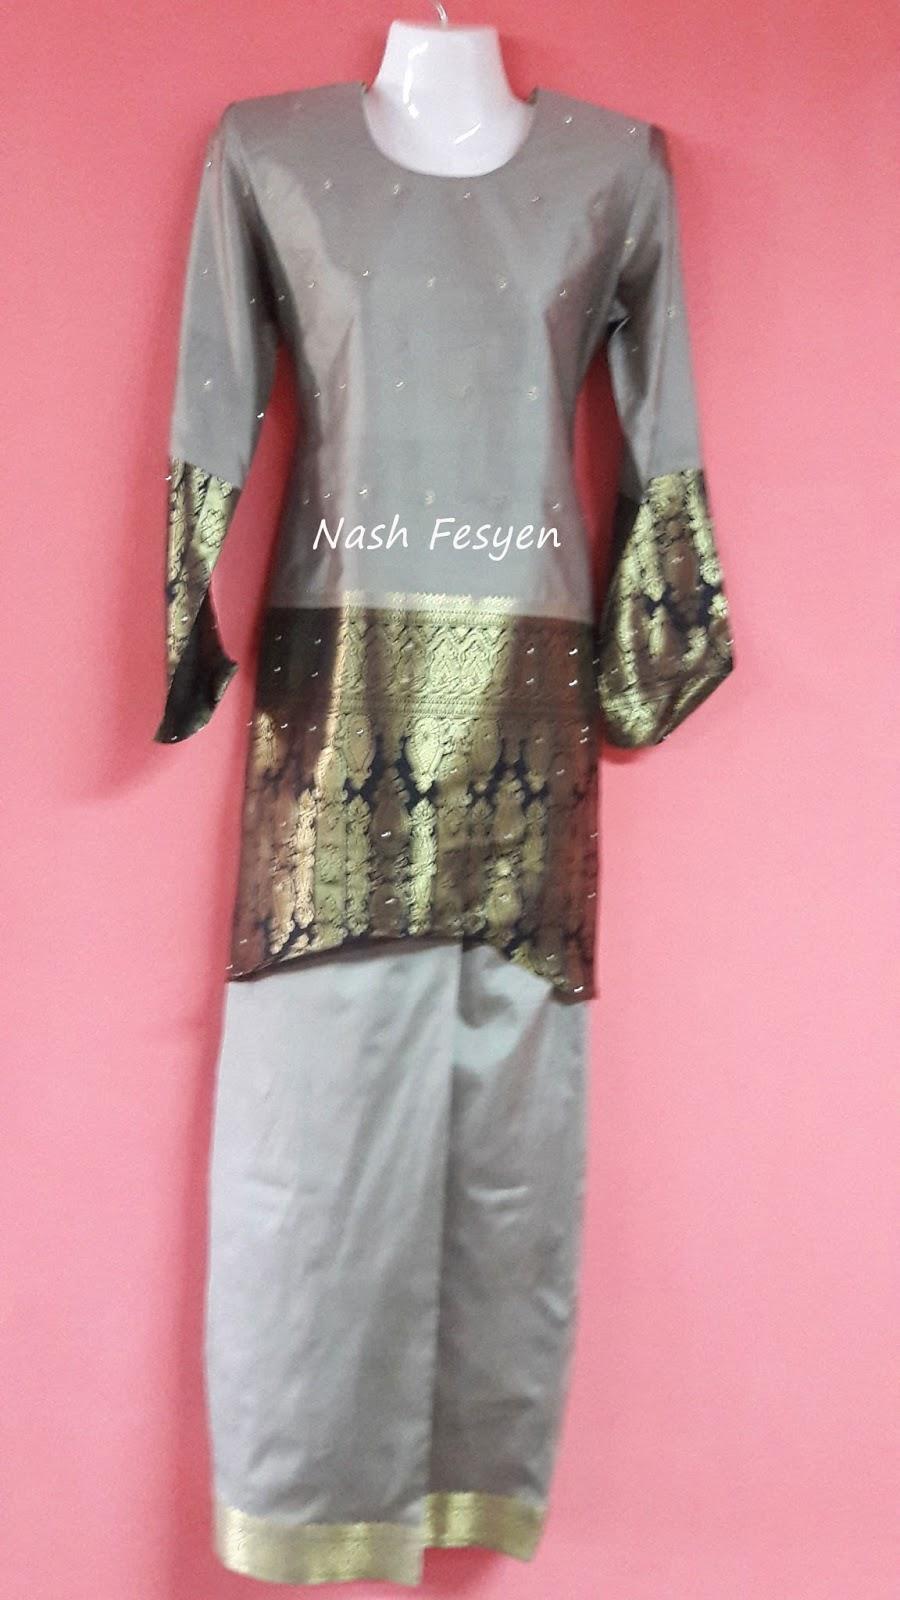 Nash Fesyen Baju Kain Sari Untuk Tema Raya 2016